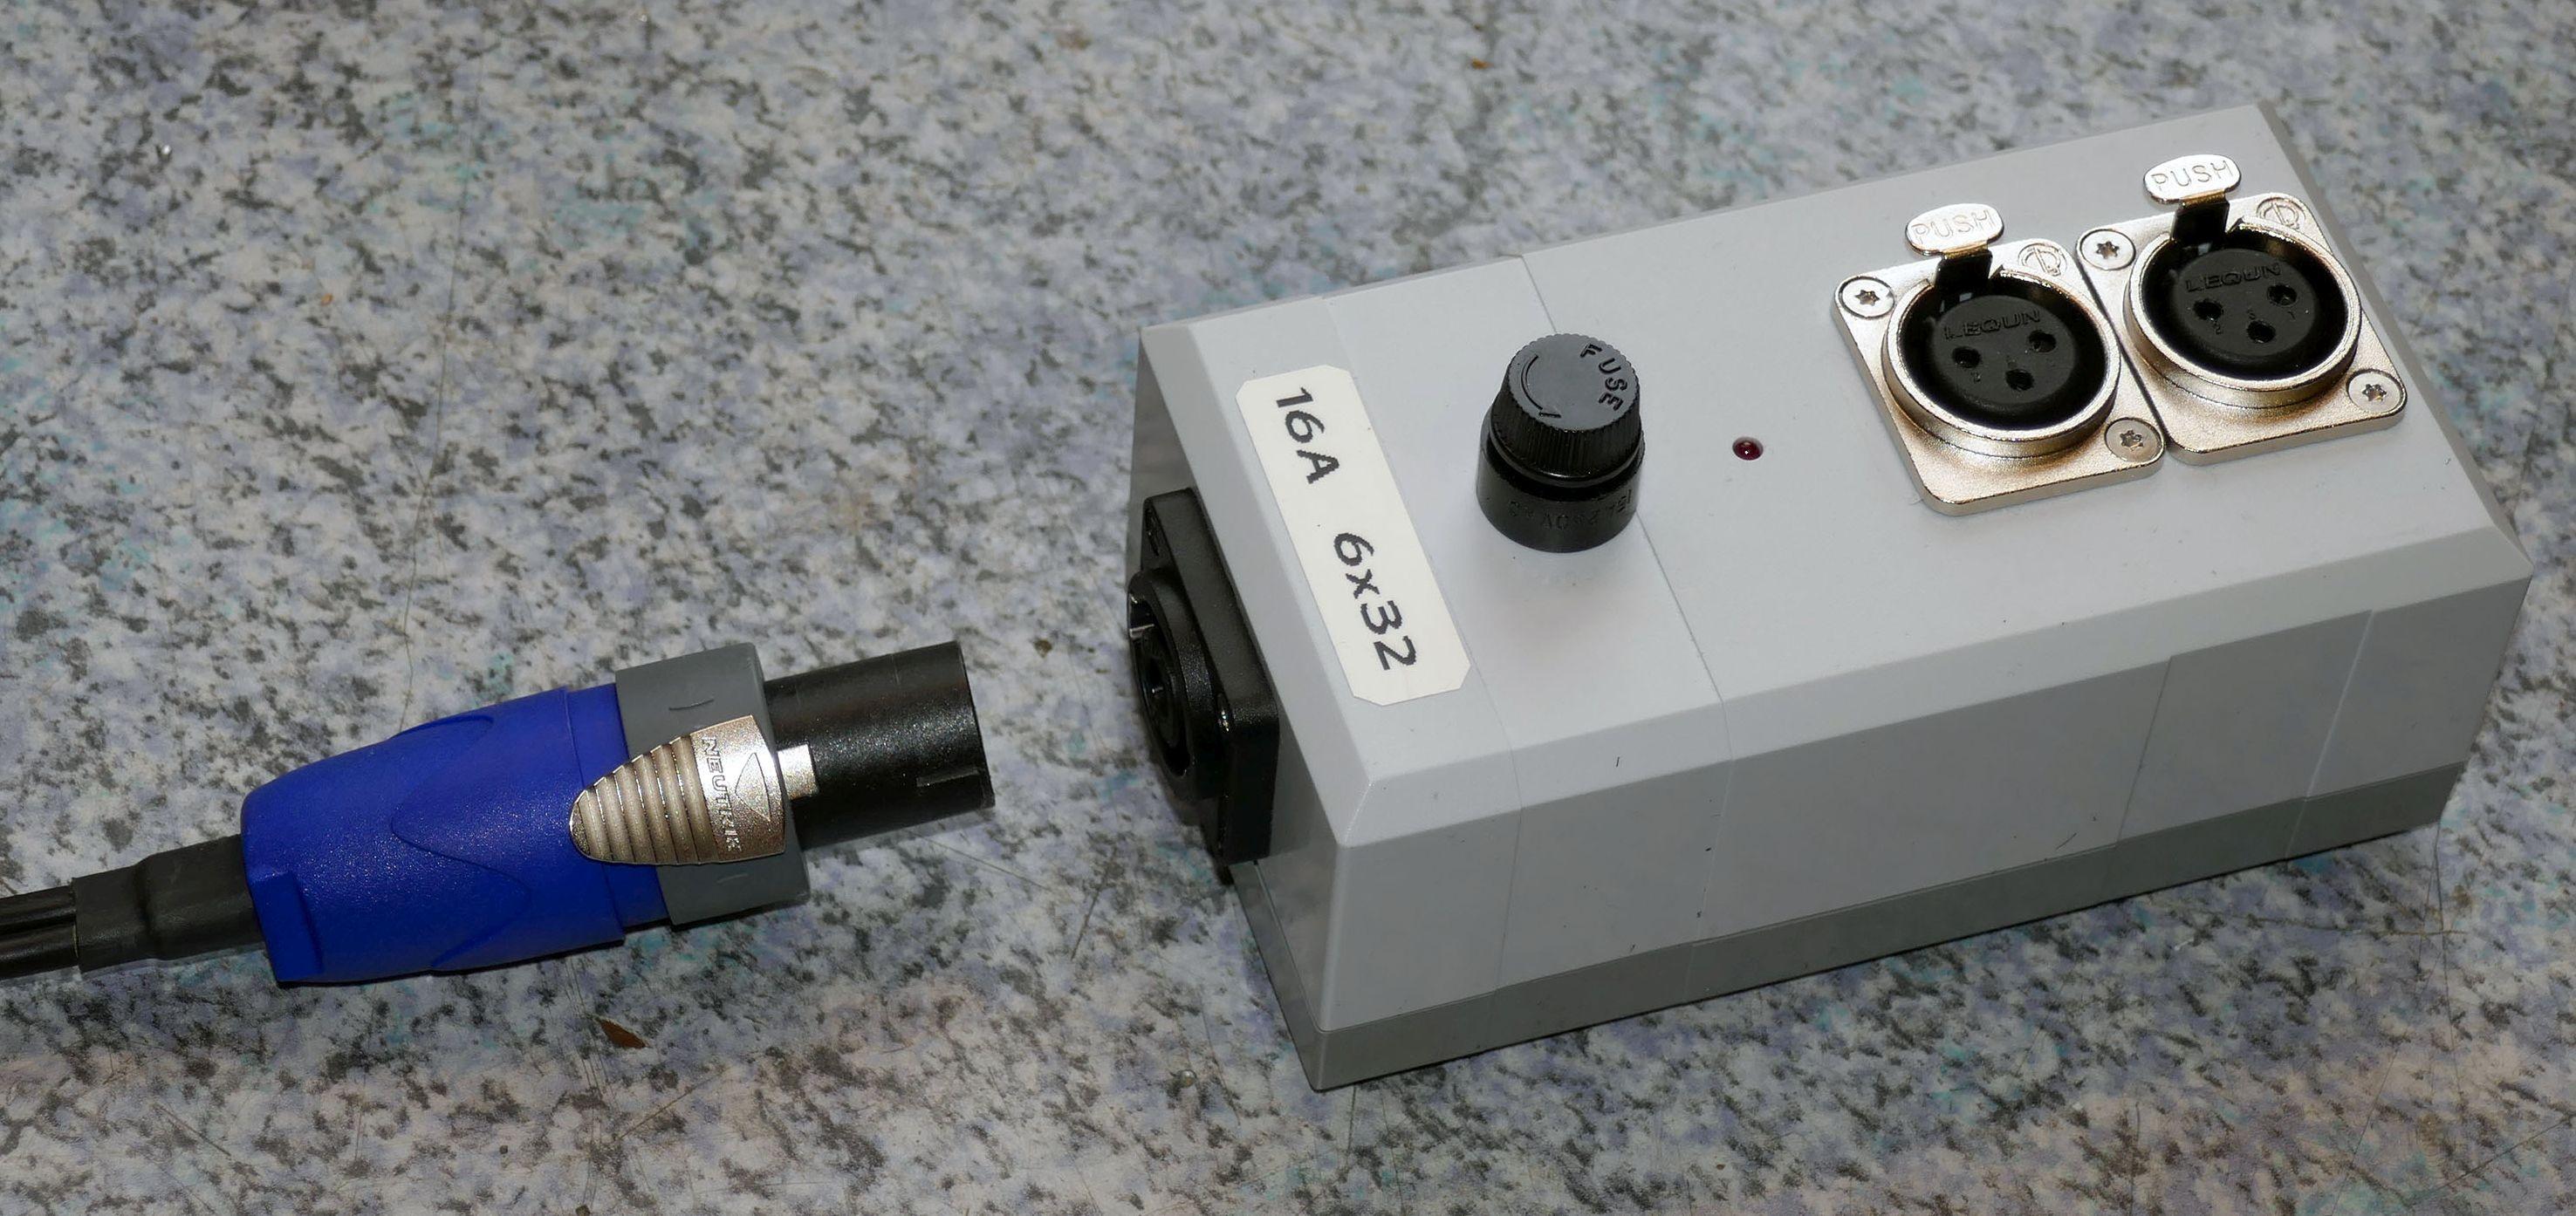 Verteilerbox 12 V Anschlussbox 12V XLR-Stecker